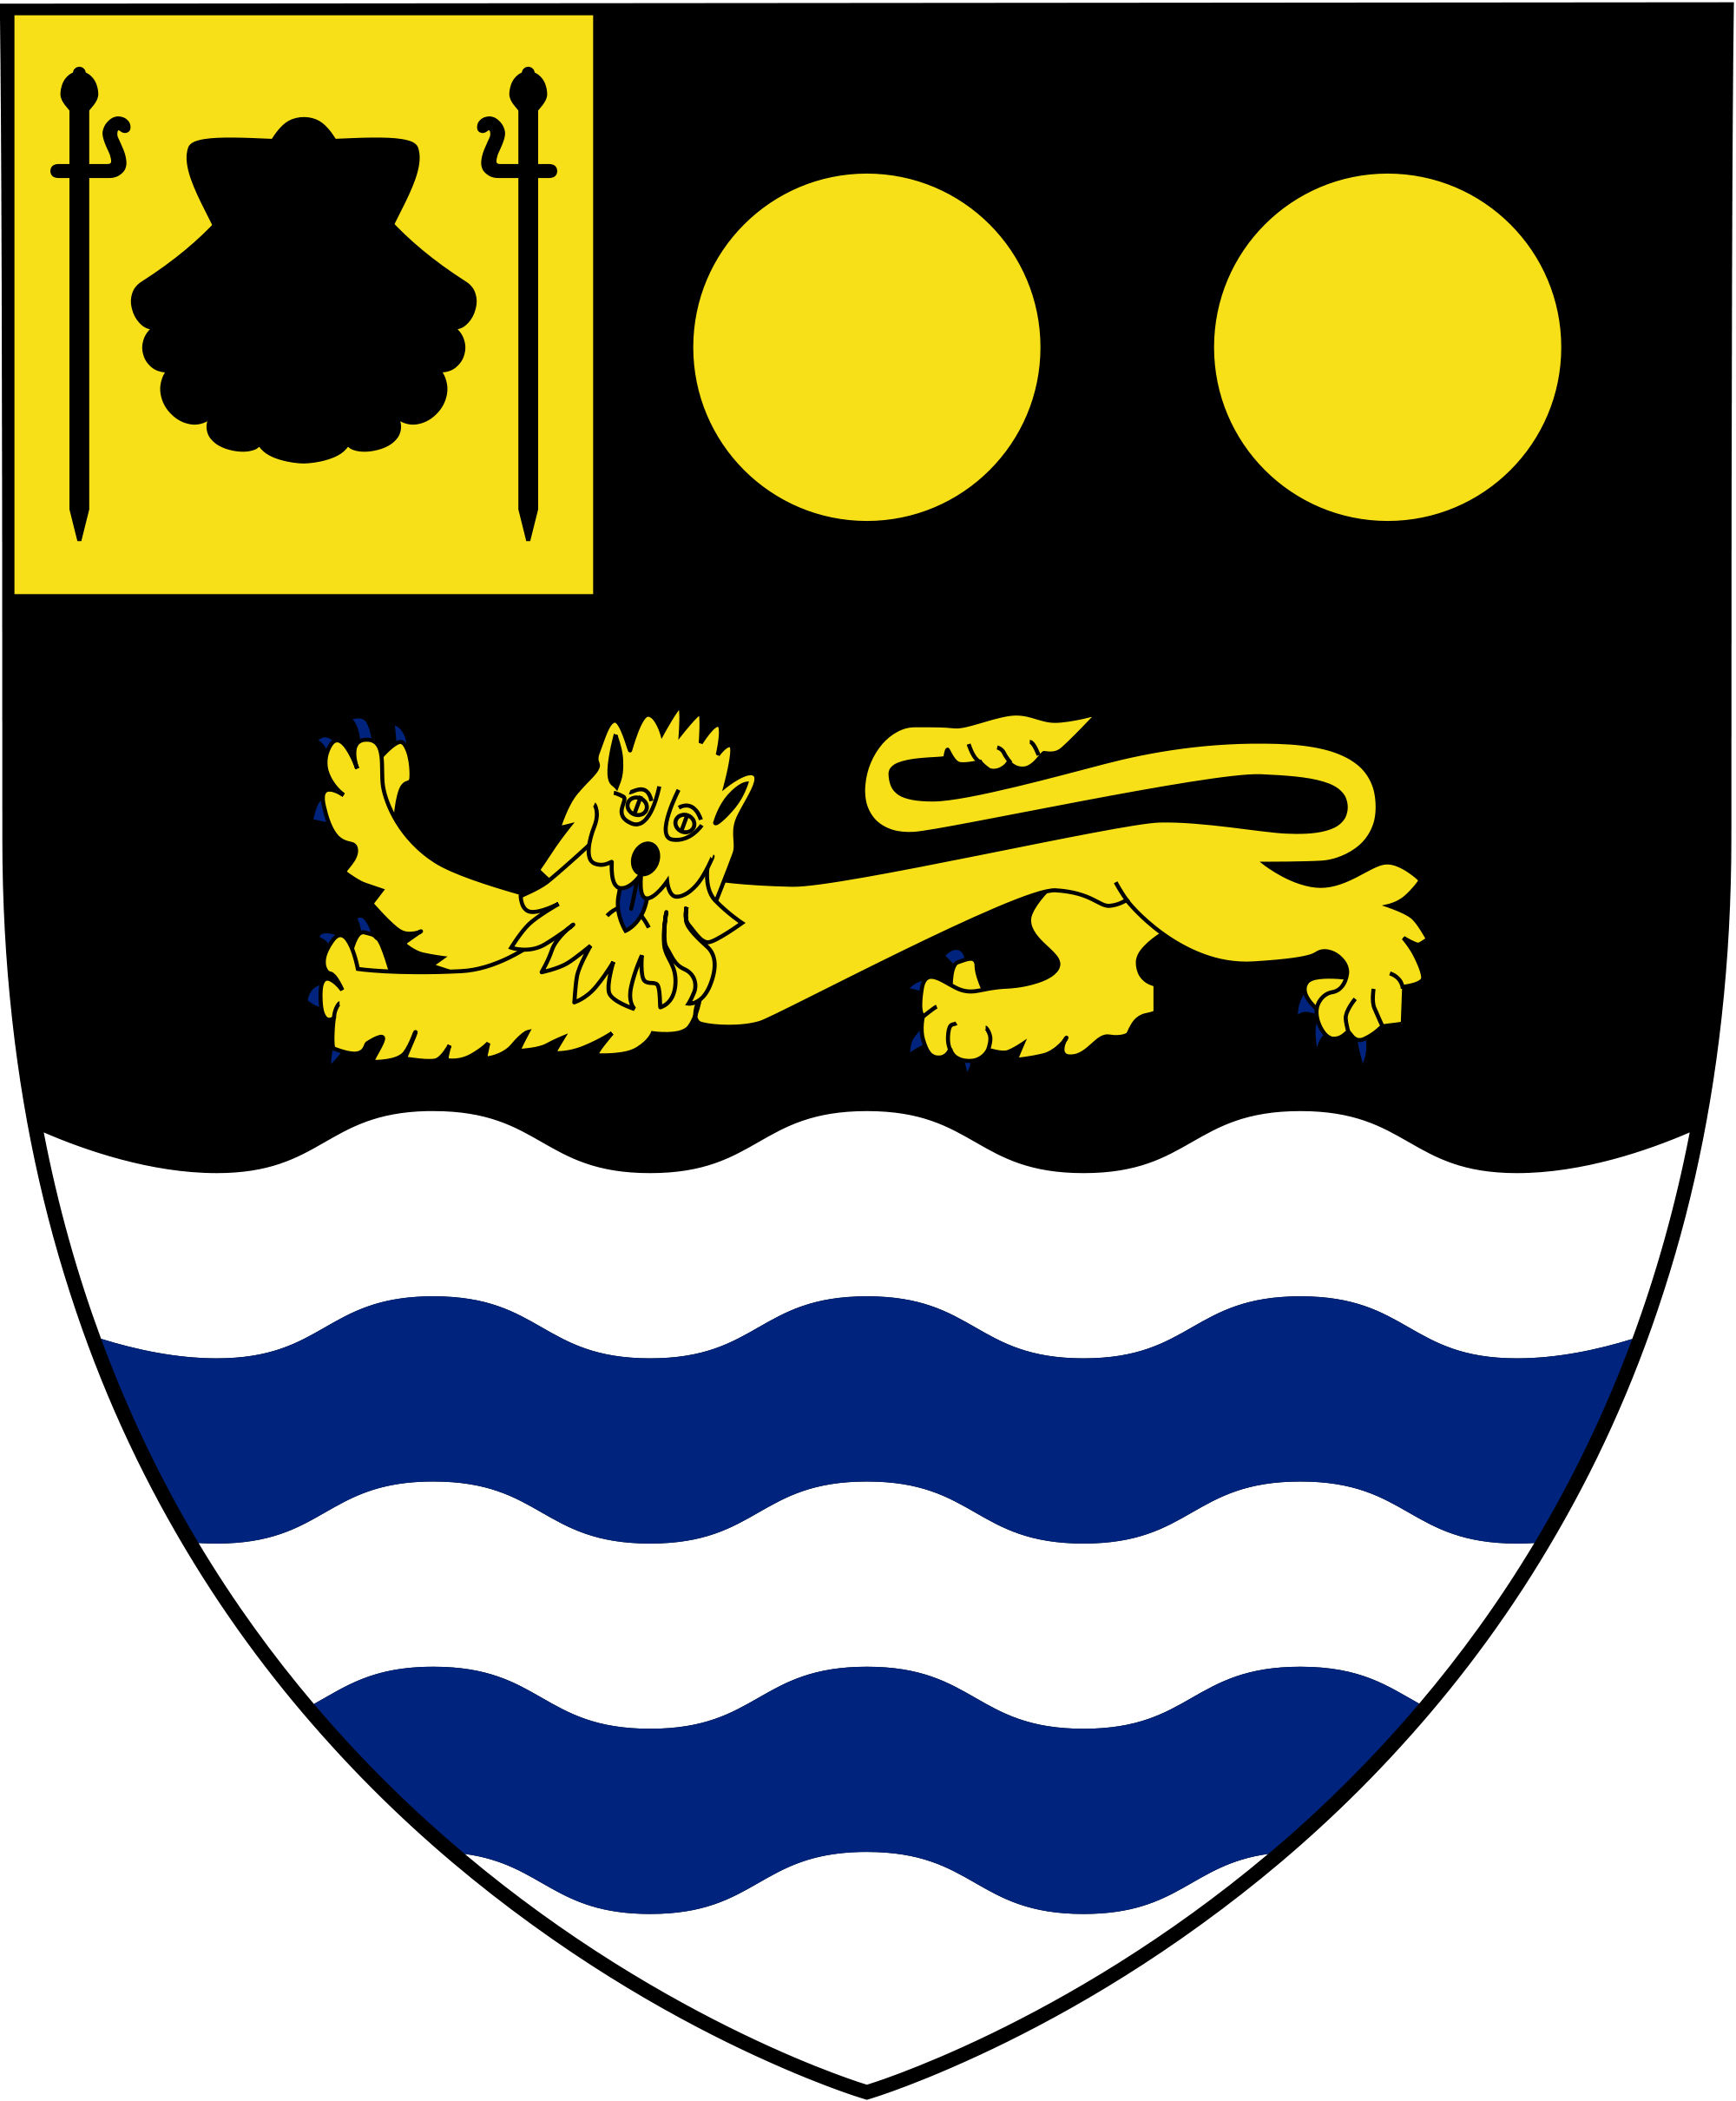 File arms of john. Shell clipart heraldic scallop